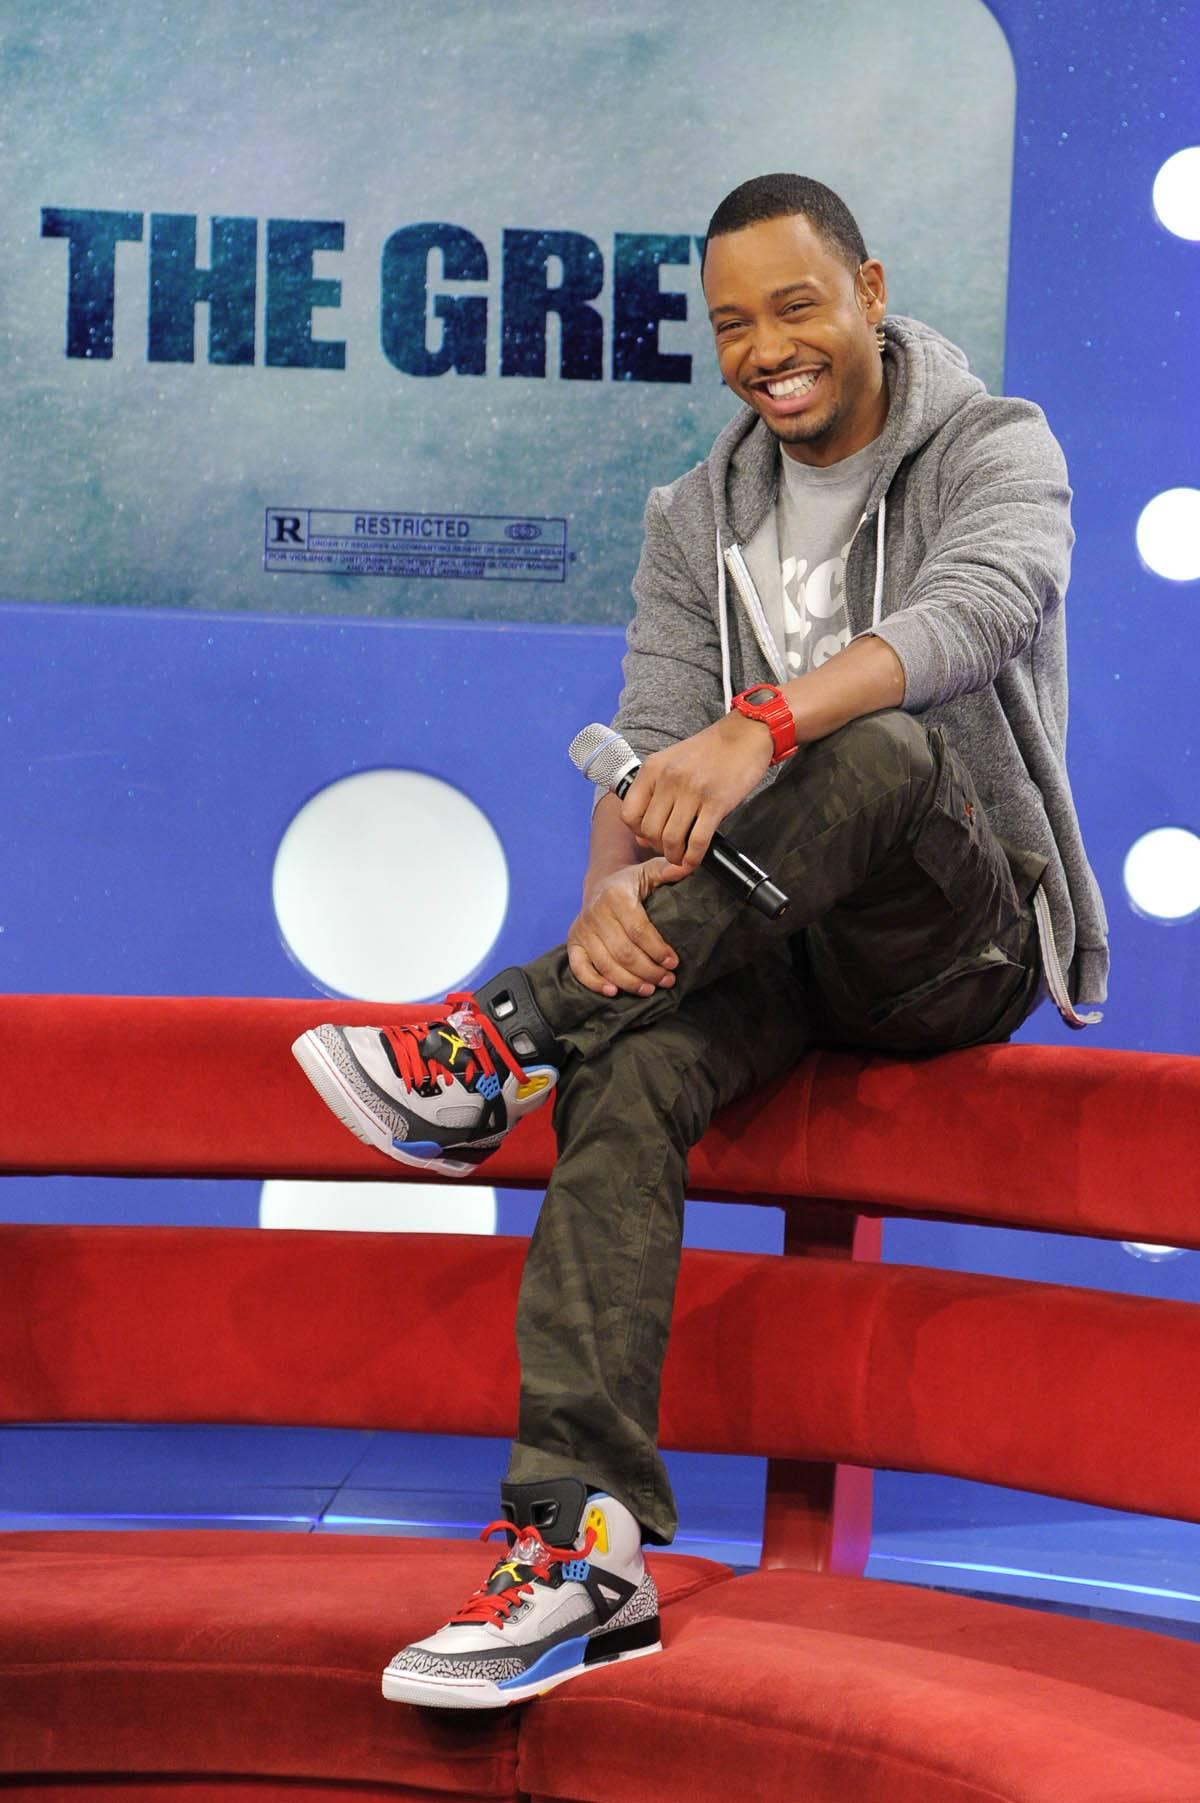 All Laughs - Terrence J at 106 & Park, January 26, 2012. (Photo: John Ricard / BET)